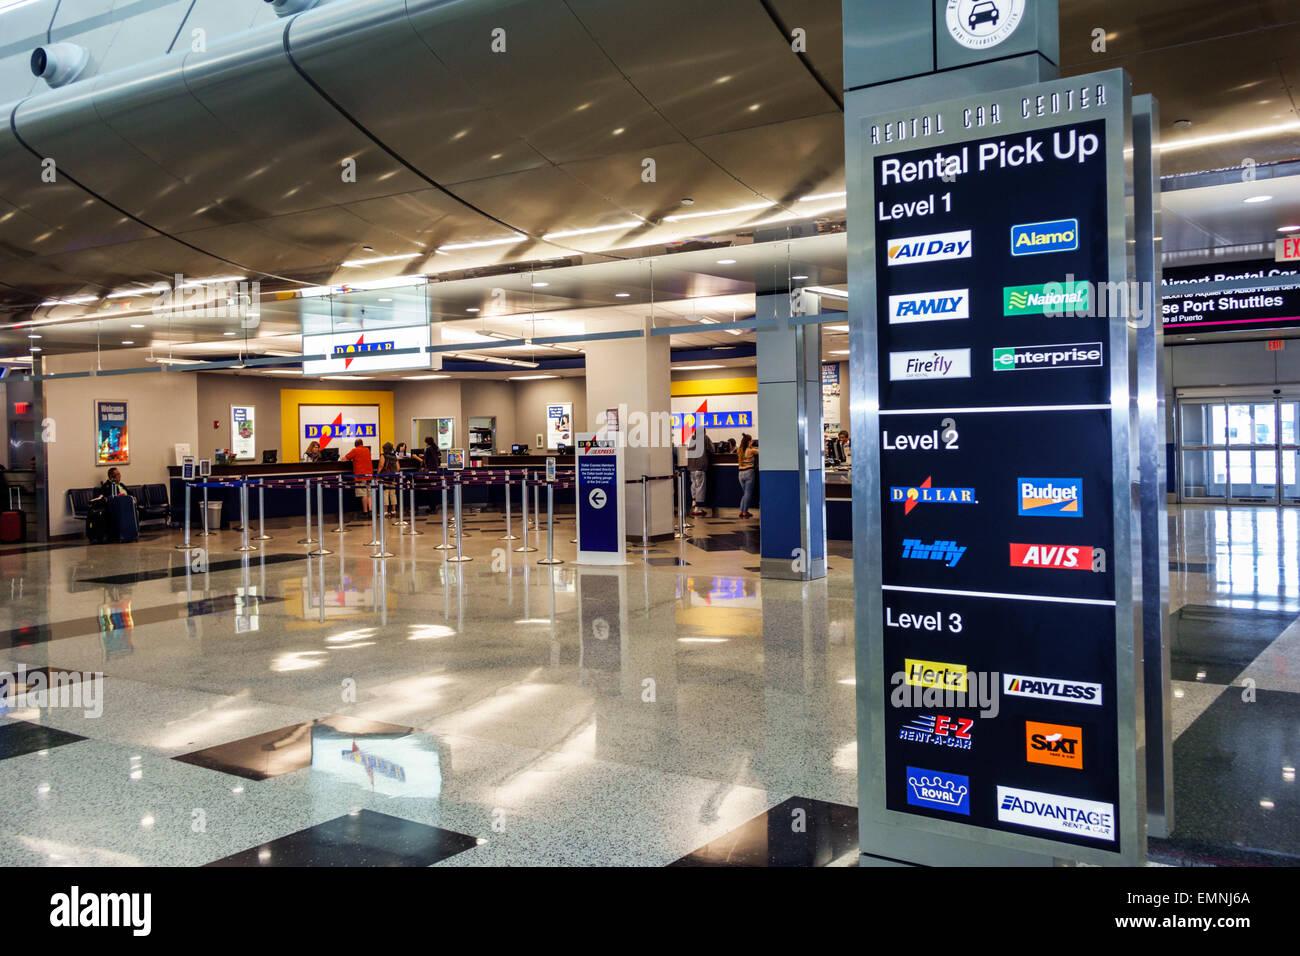 Miami Florida International Airport Mia Rental Car Center